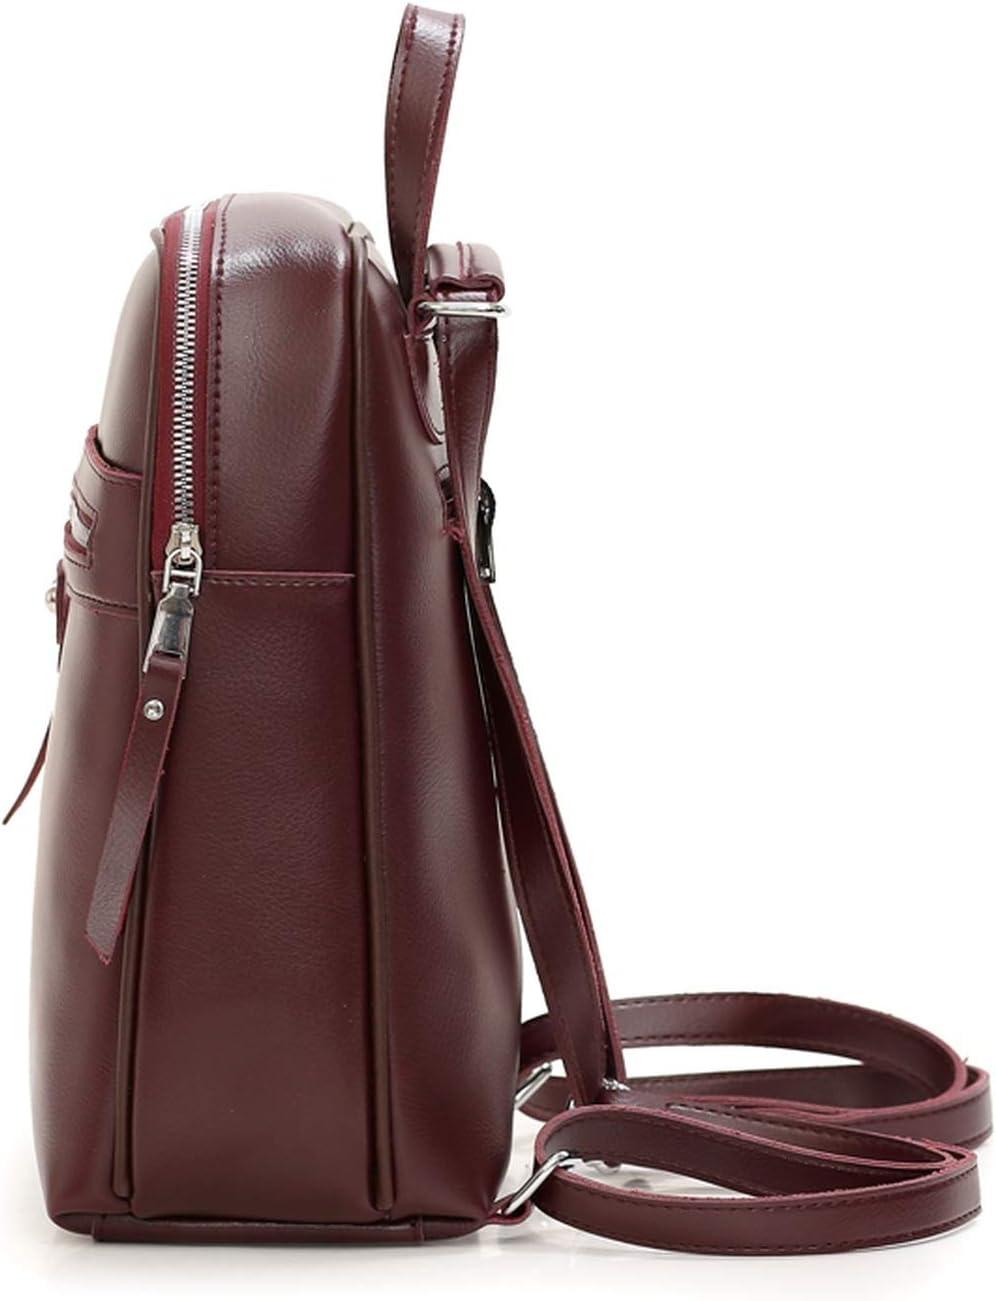 Vintage Women Backpack Leather WomenS Shoulder Bag Large Capacity School Bags For Teenagers Girls Leisure School Backpack,Black,29Cm 13Cm 31Cm